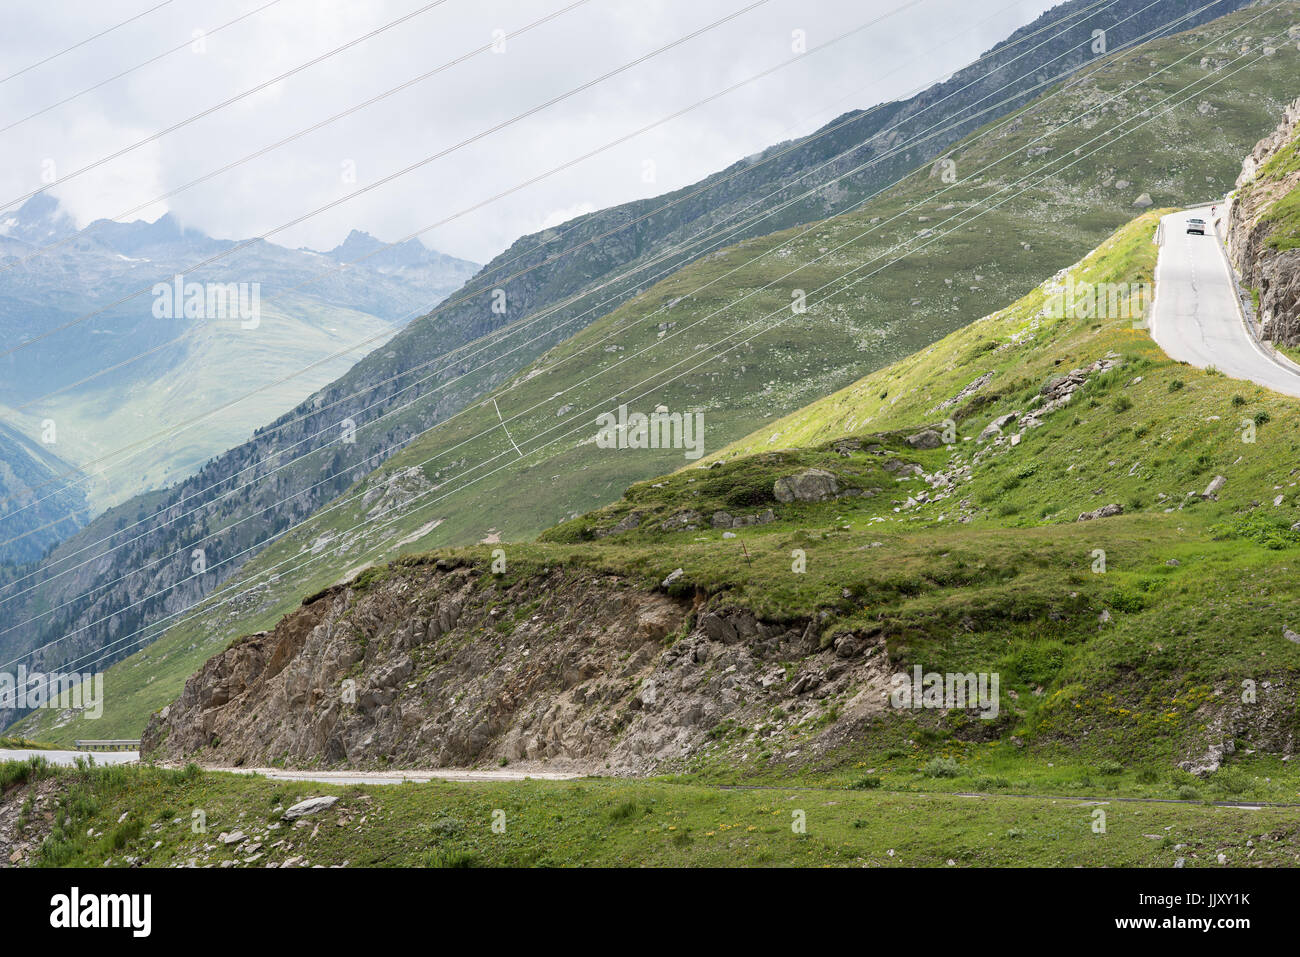 Nufenenpass svizzera Immagini Stock